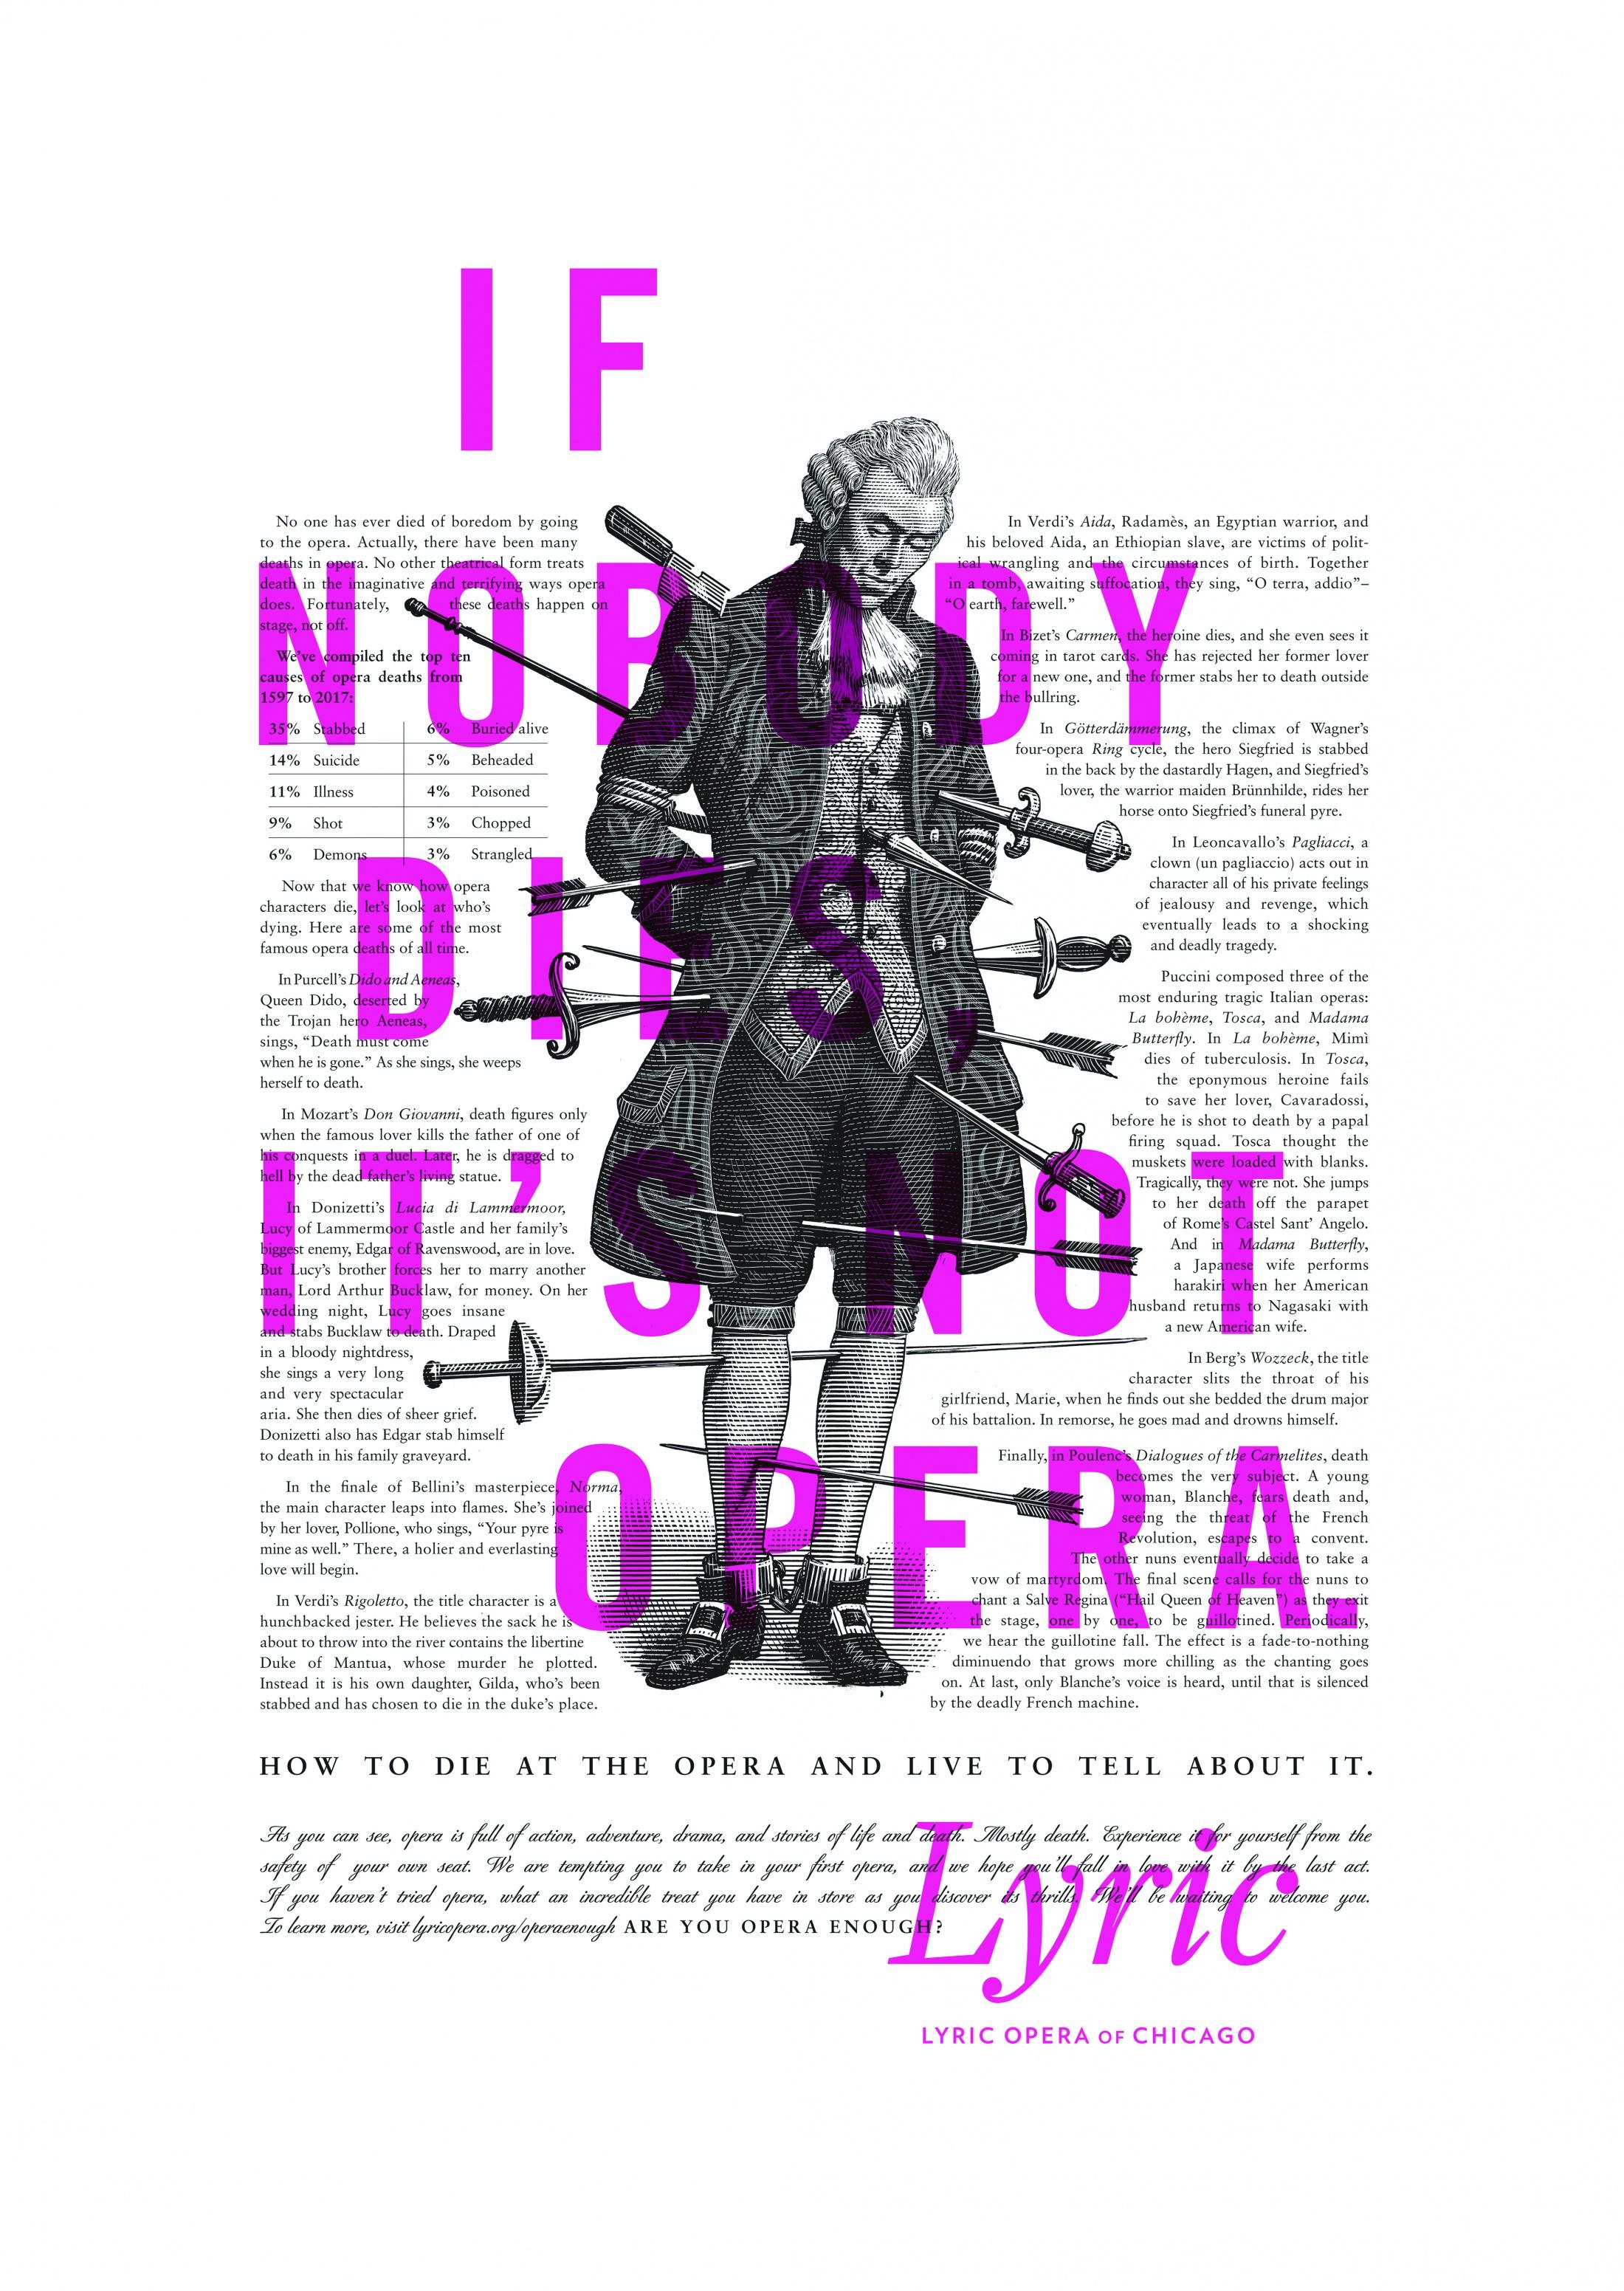 Thumbnail for Lyric Opera OOH: Deaths